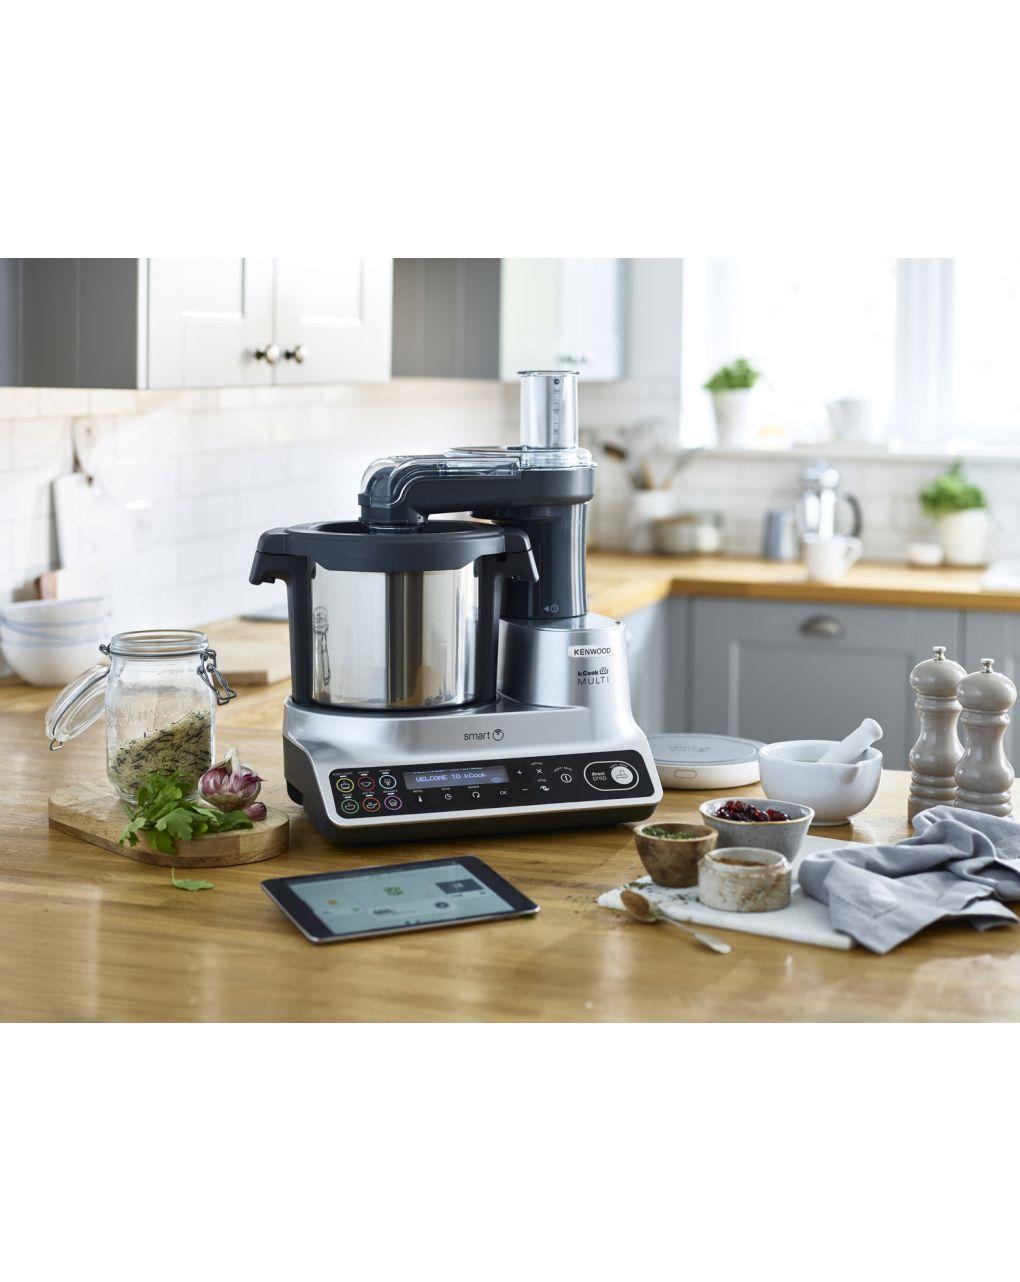 Kcook multi smart - Kenwood